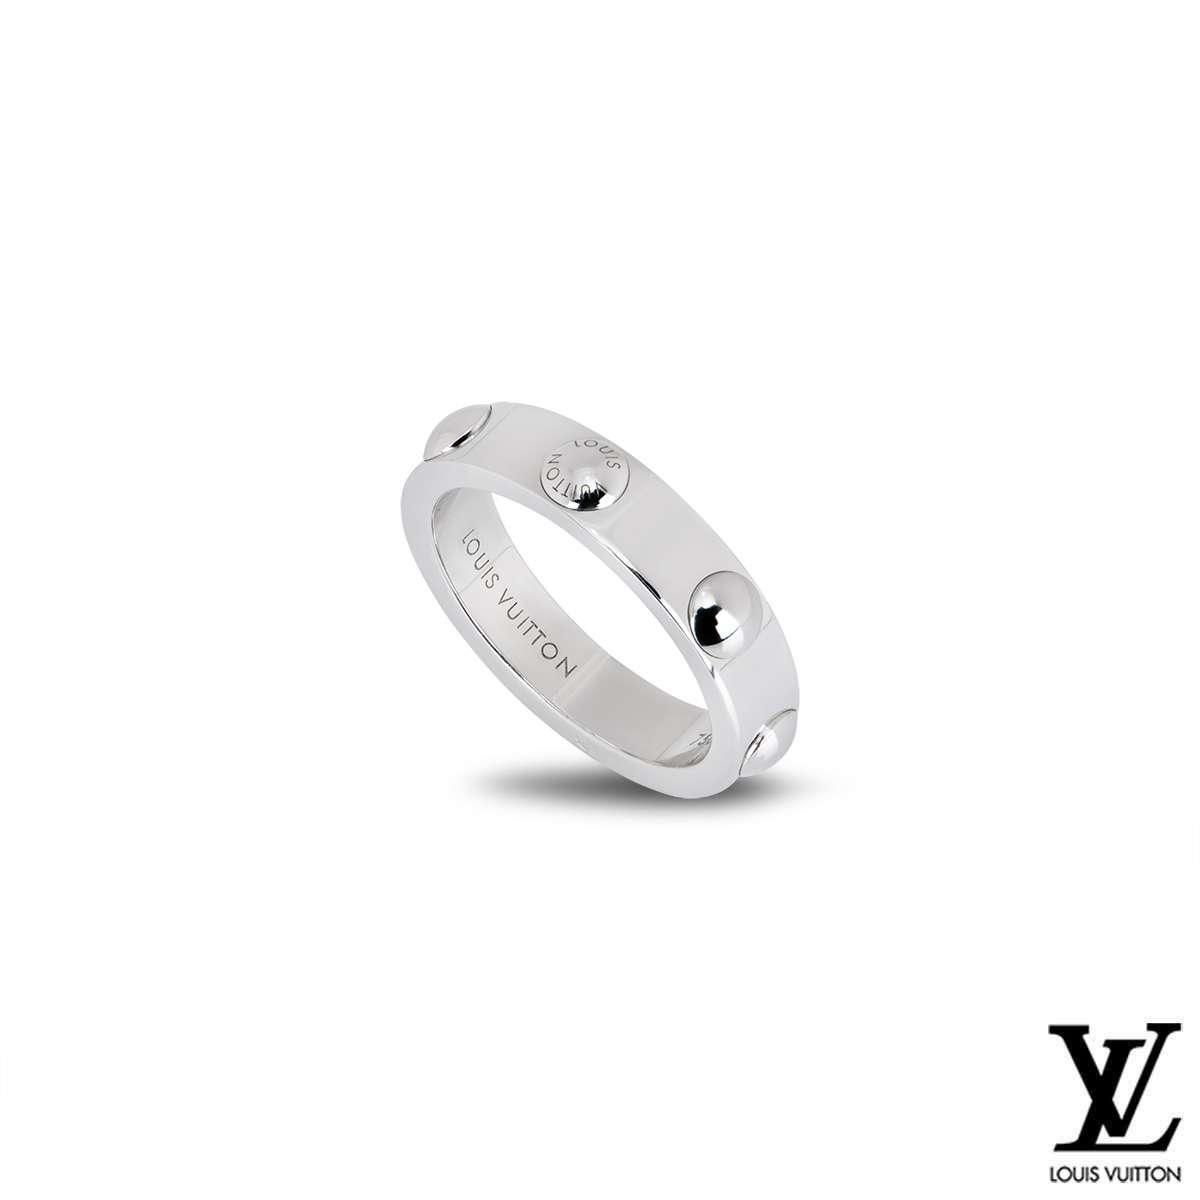 Louis Vuitton 18k White Gold Empreinte Ring